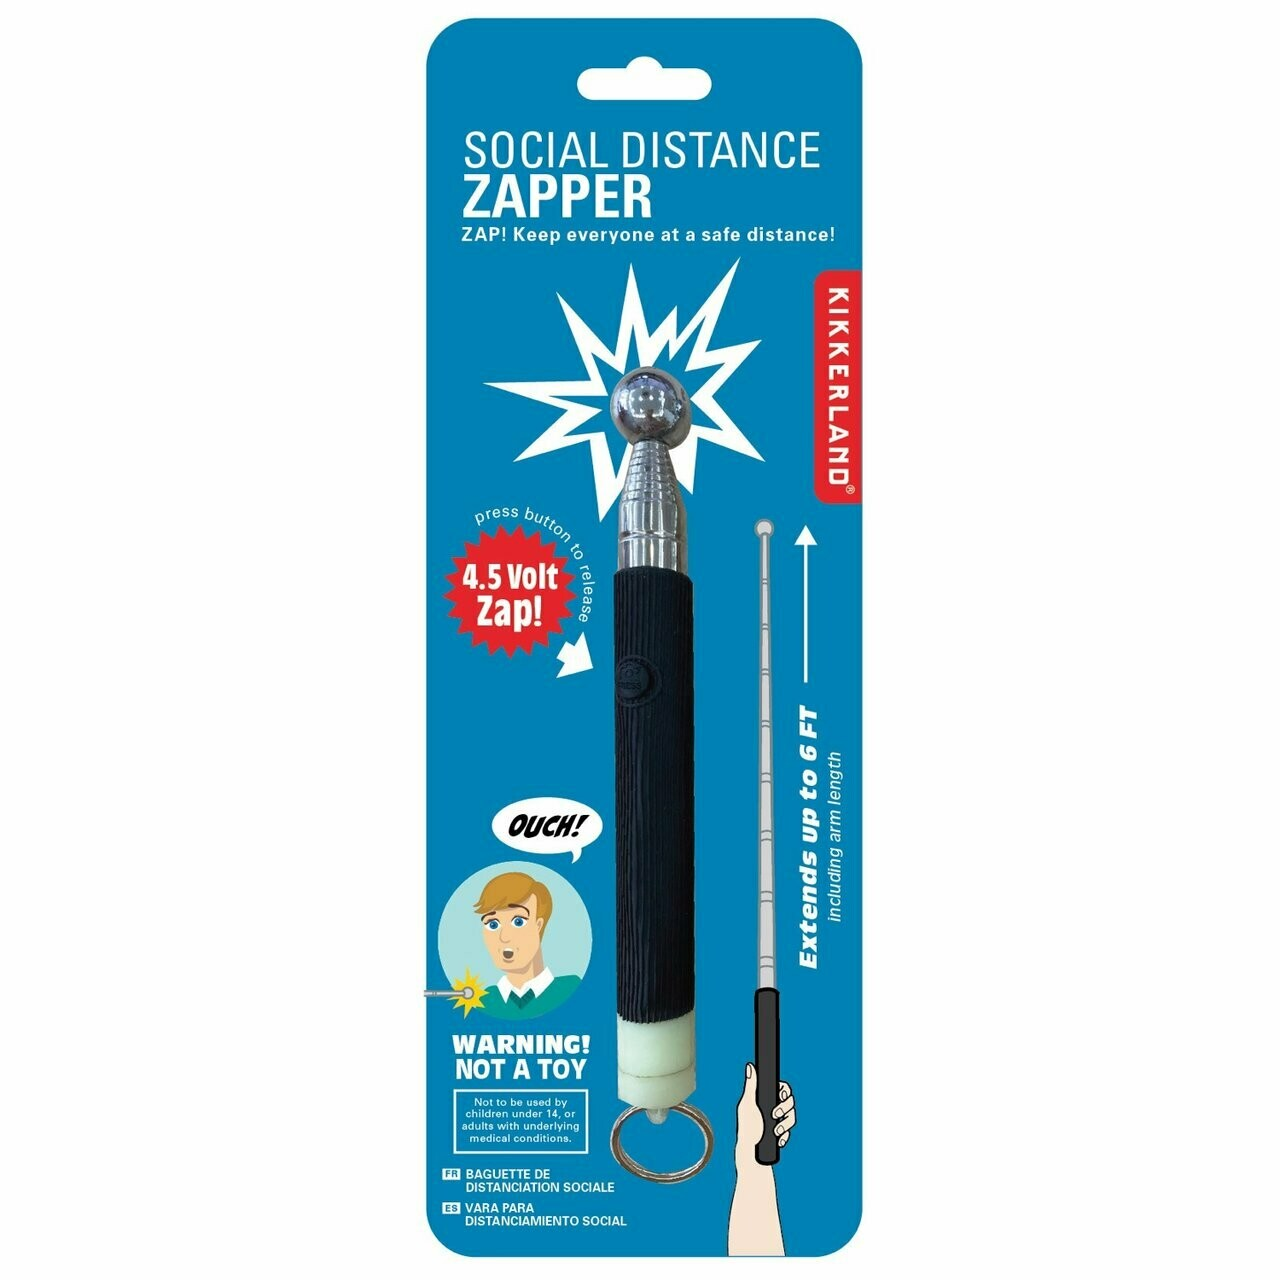 Social Distance Zapper